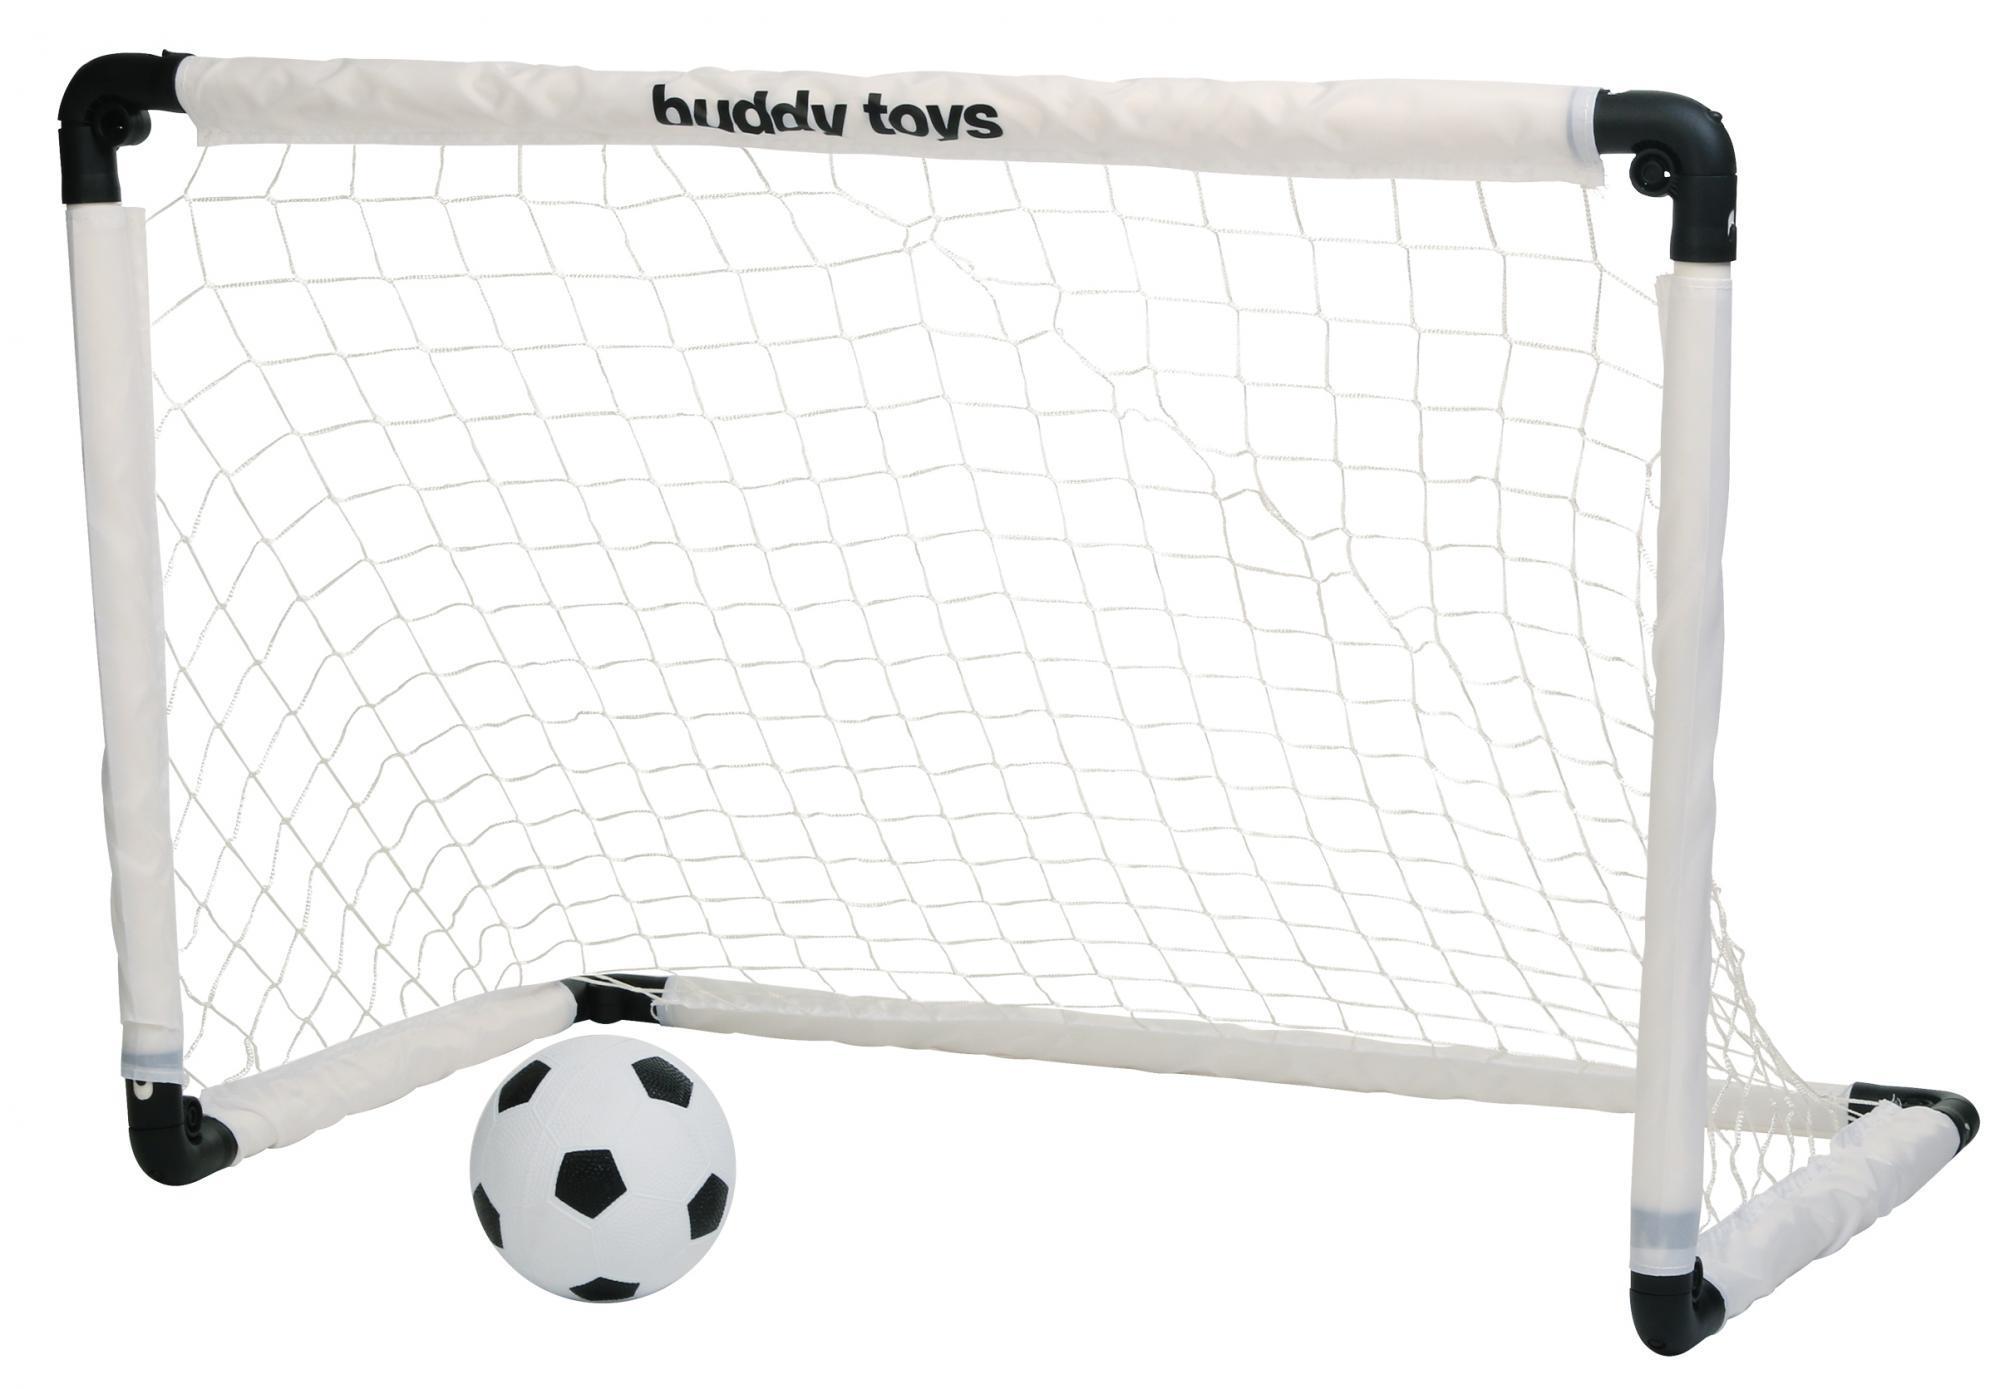 Buddy Toys Saliekami futbola vārti BOT 3110 bumba